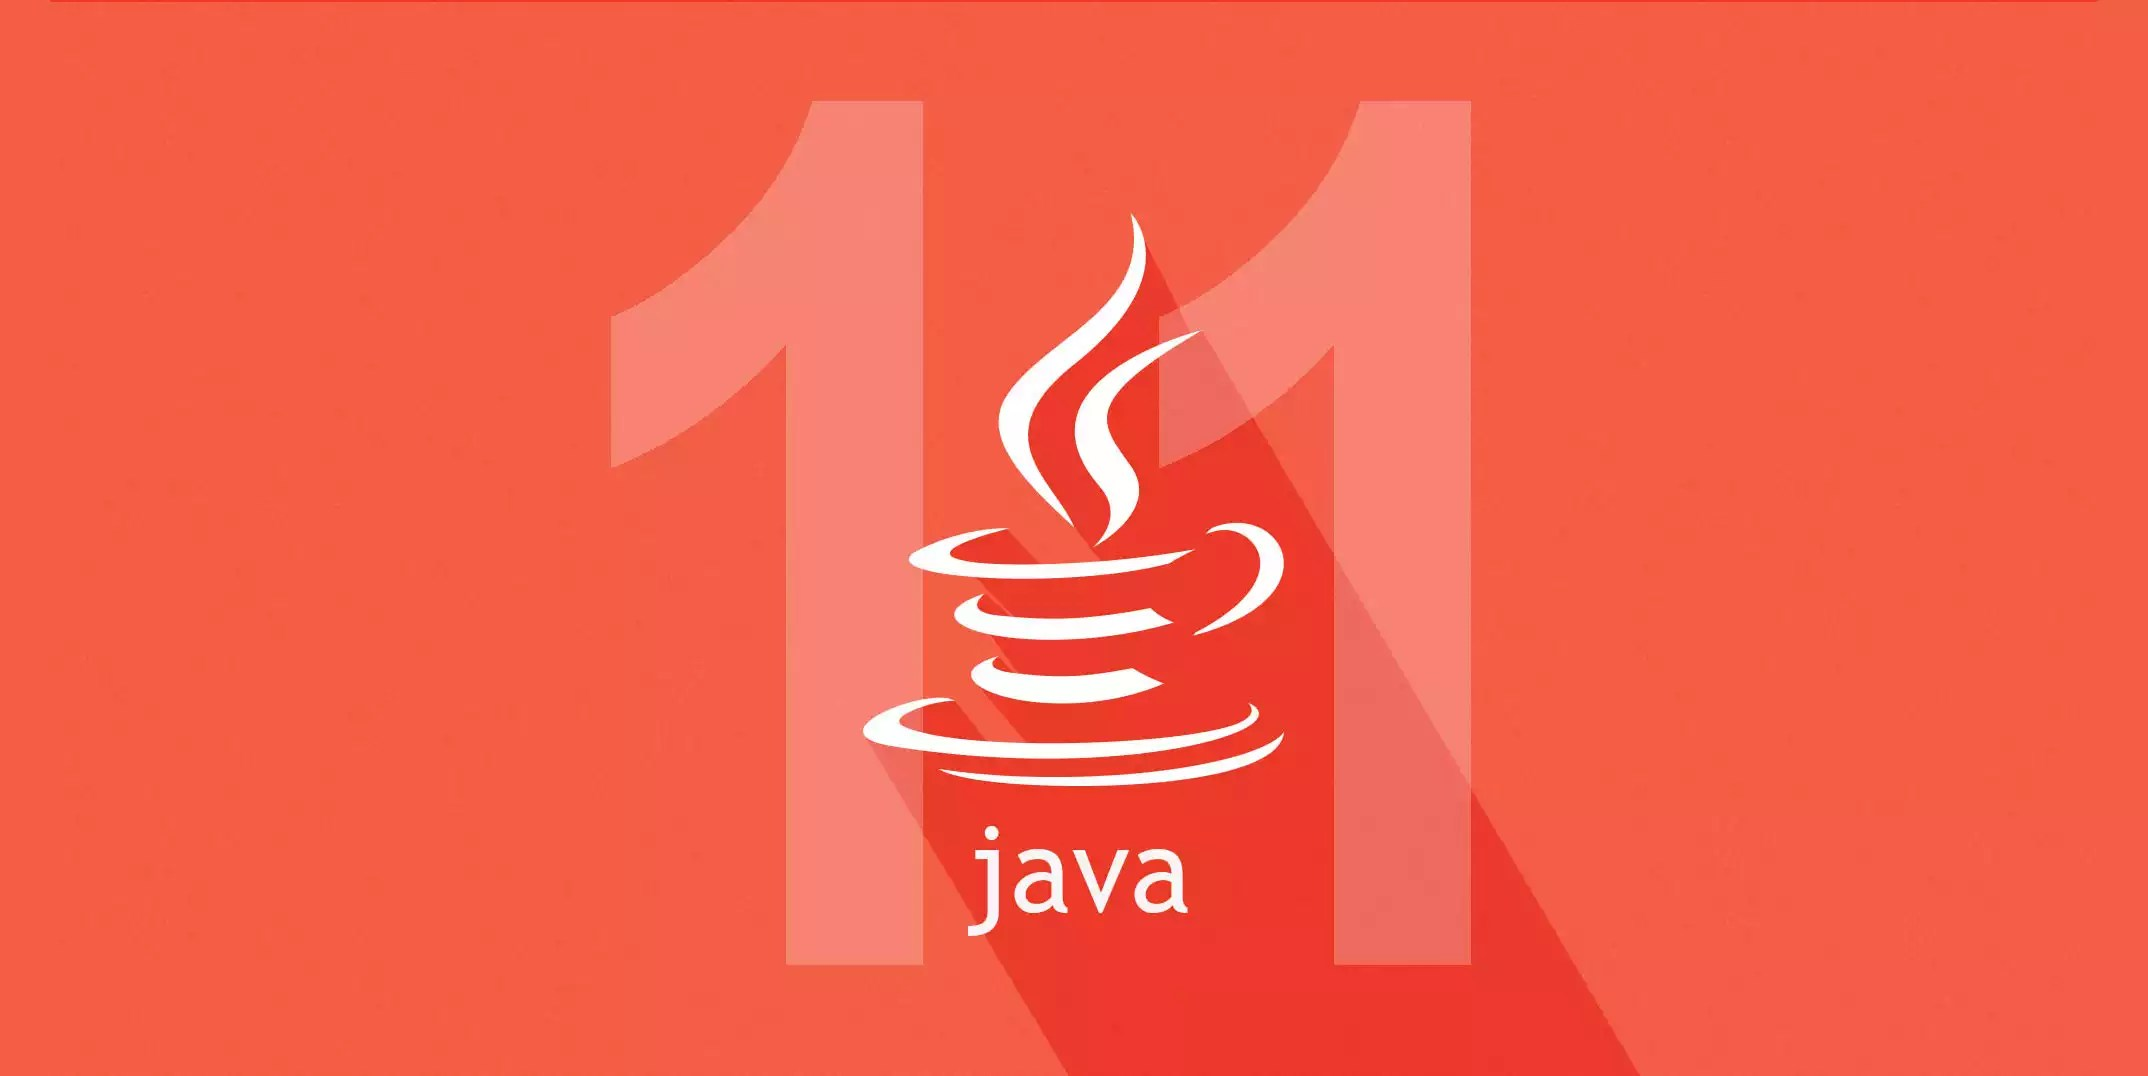 Como instalar o Oracle Java 11 no Ubuntu, Linux Mint ou